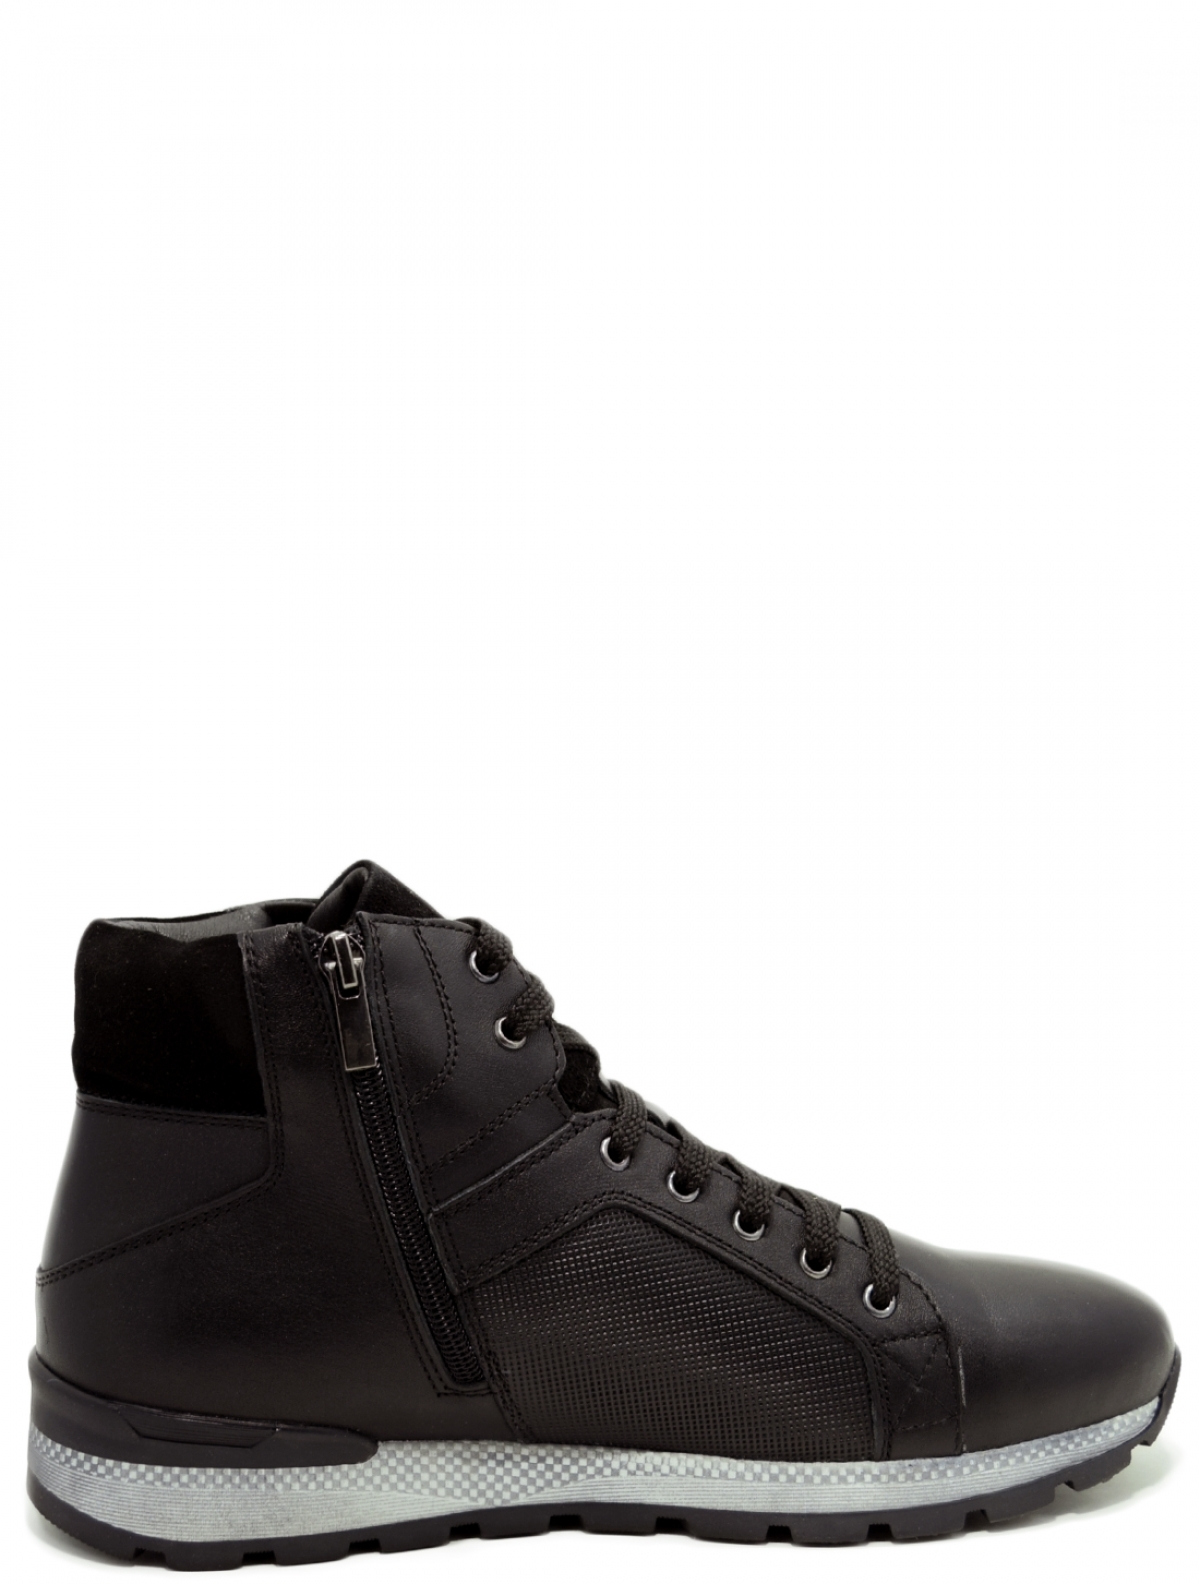 EDERRO 1019-1/1 мужские ботинки